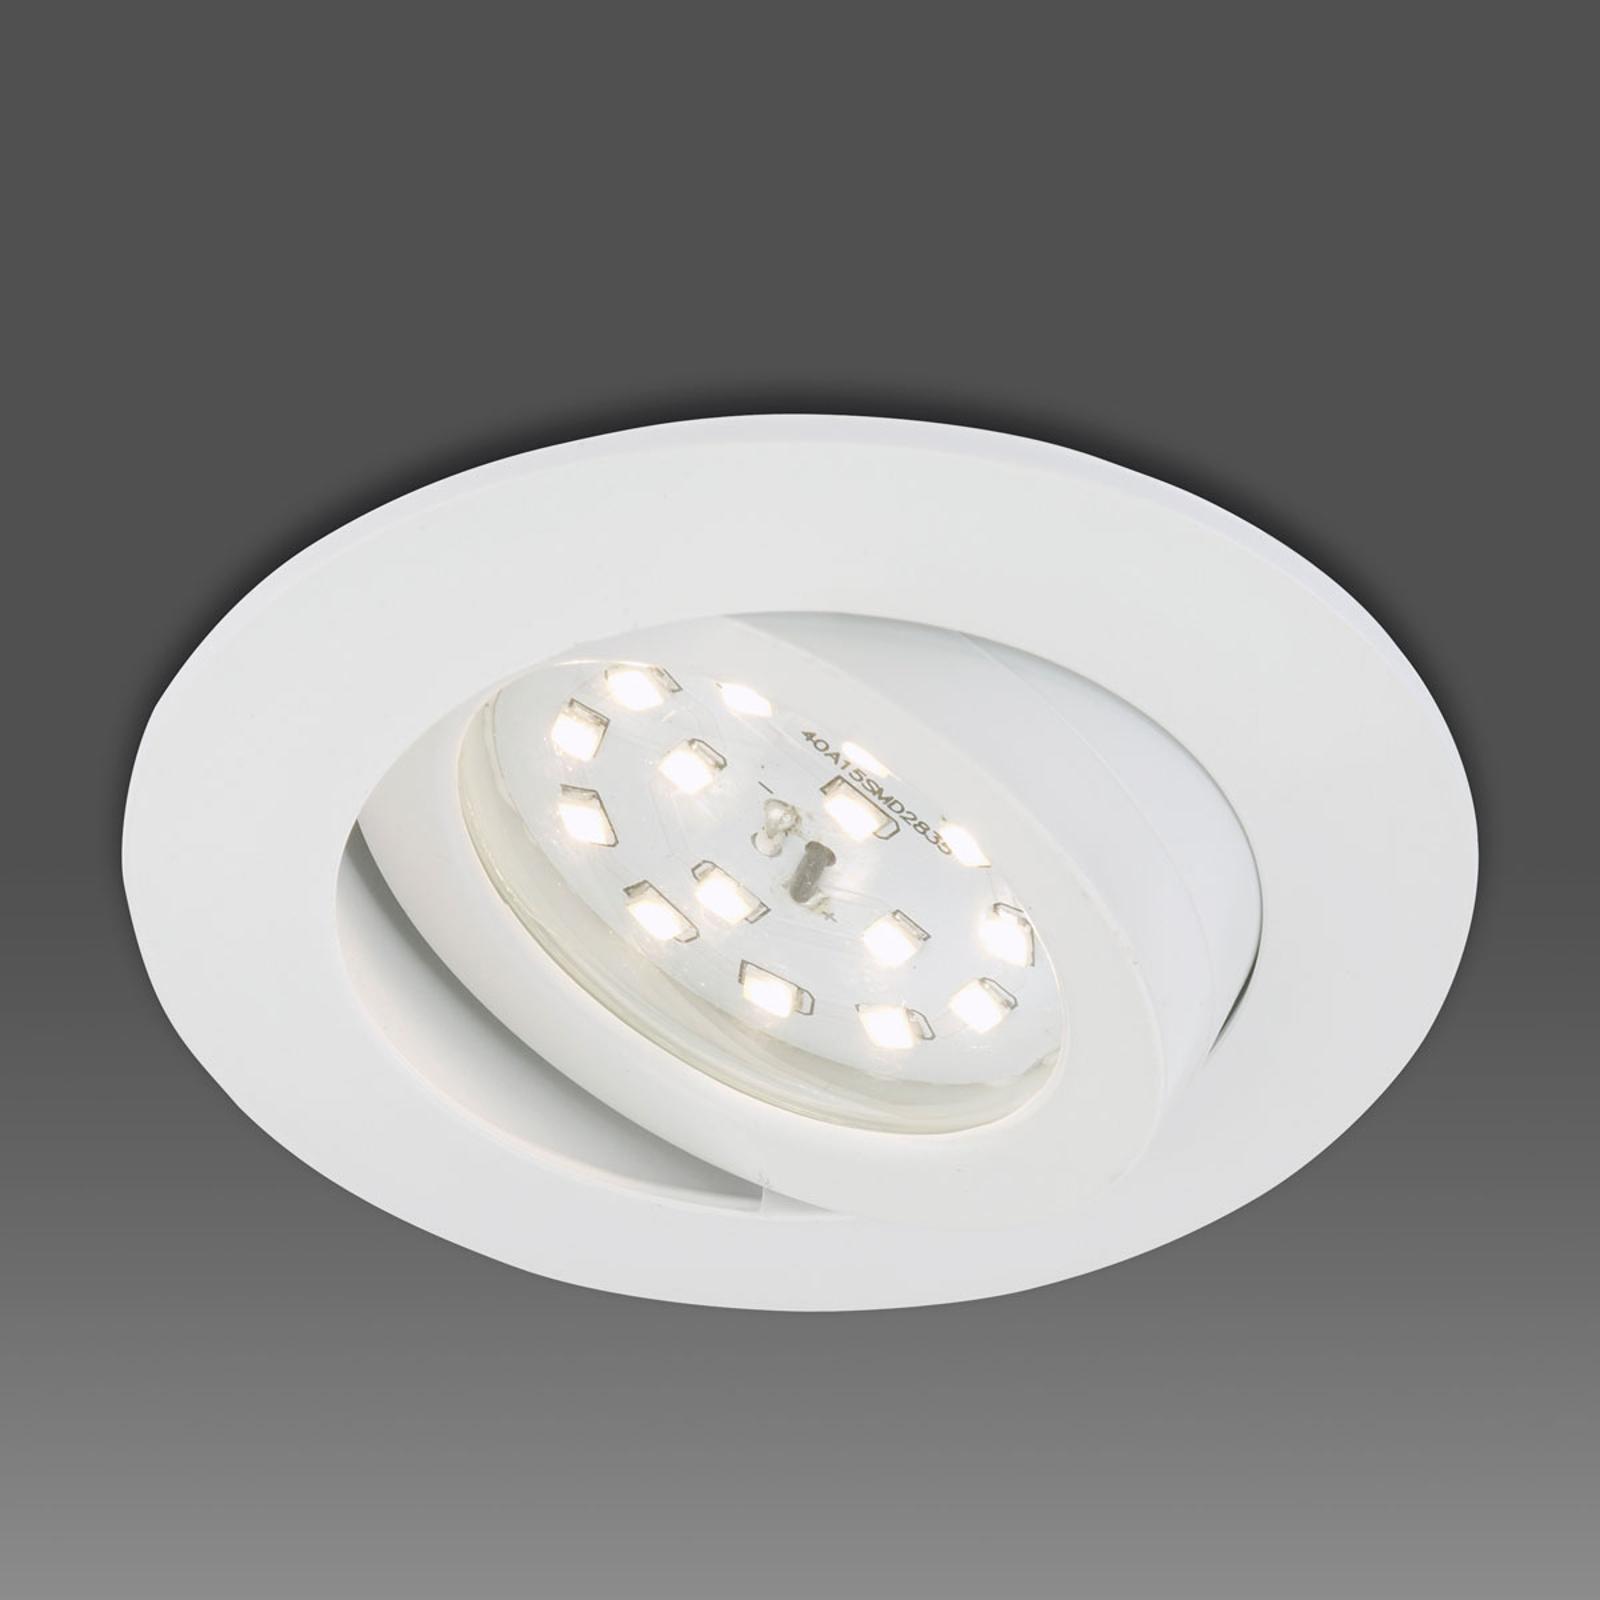 Pivotable LED recessed light Erik, white_1510281_1